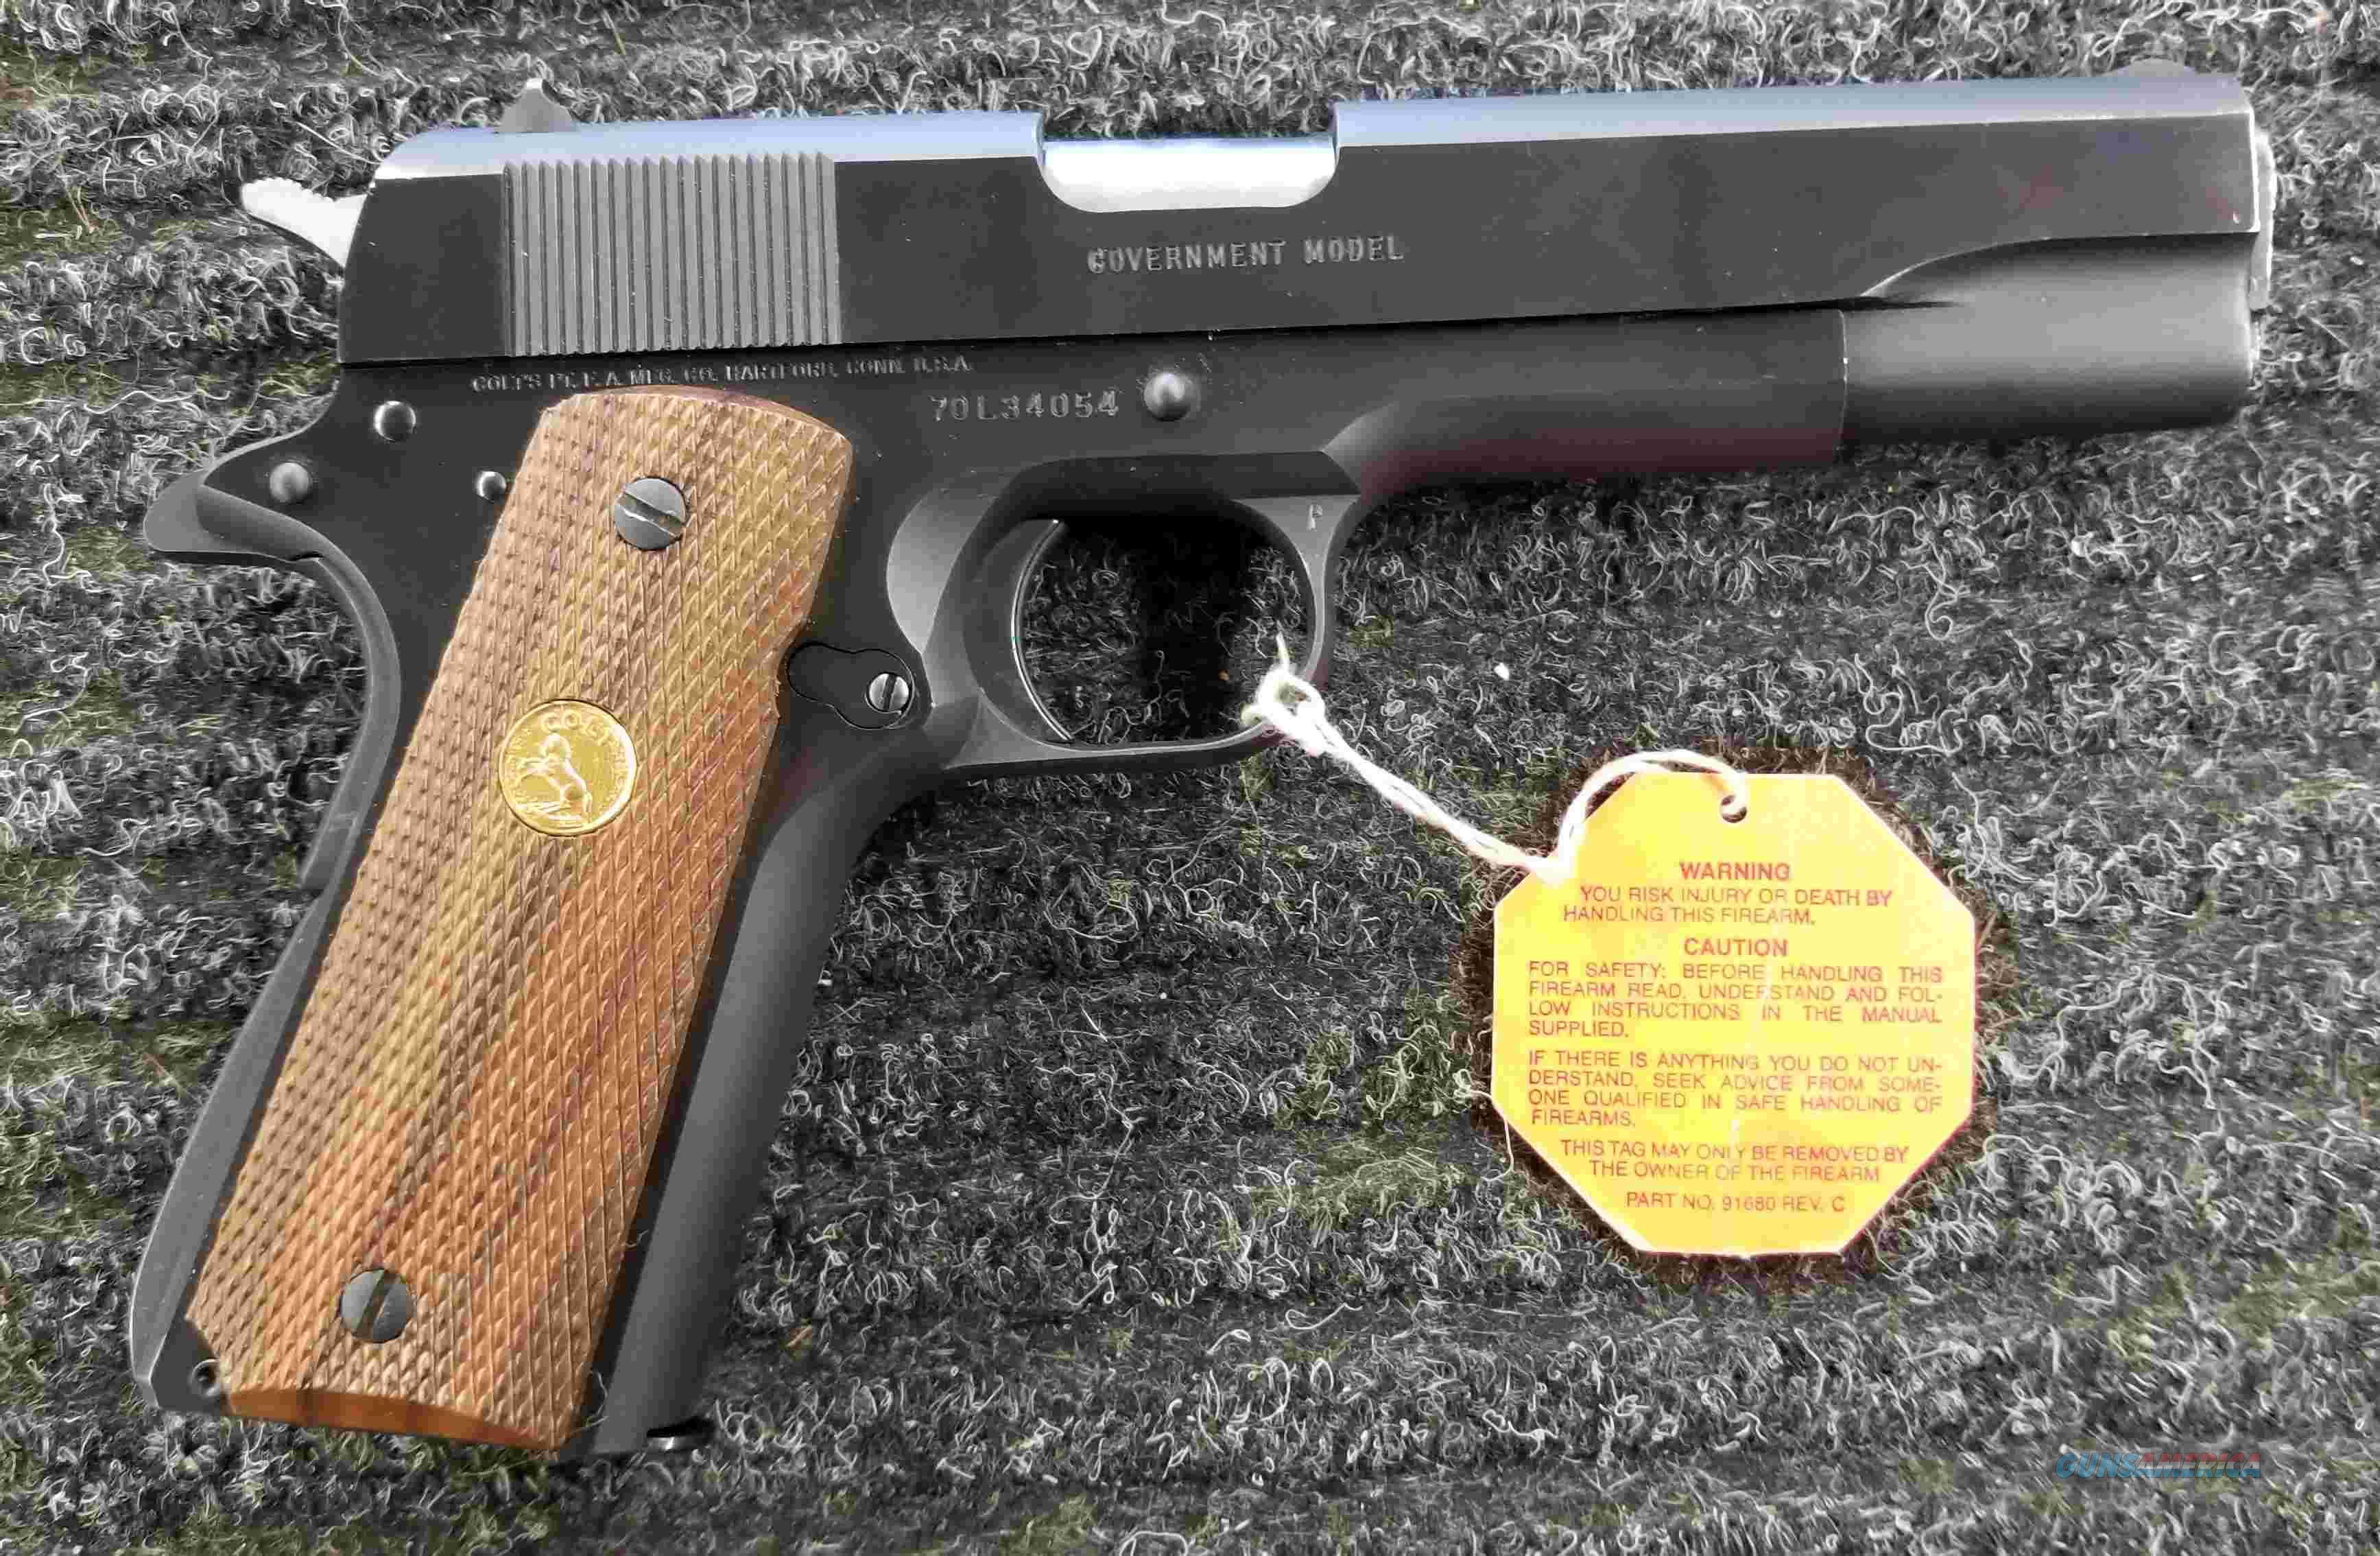 Colt Series 80 MKIV - 1911 - 45ACP - Free Shipping !!  Guns > Pistols > Colt Automatic Pistols (1911 & Var)